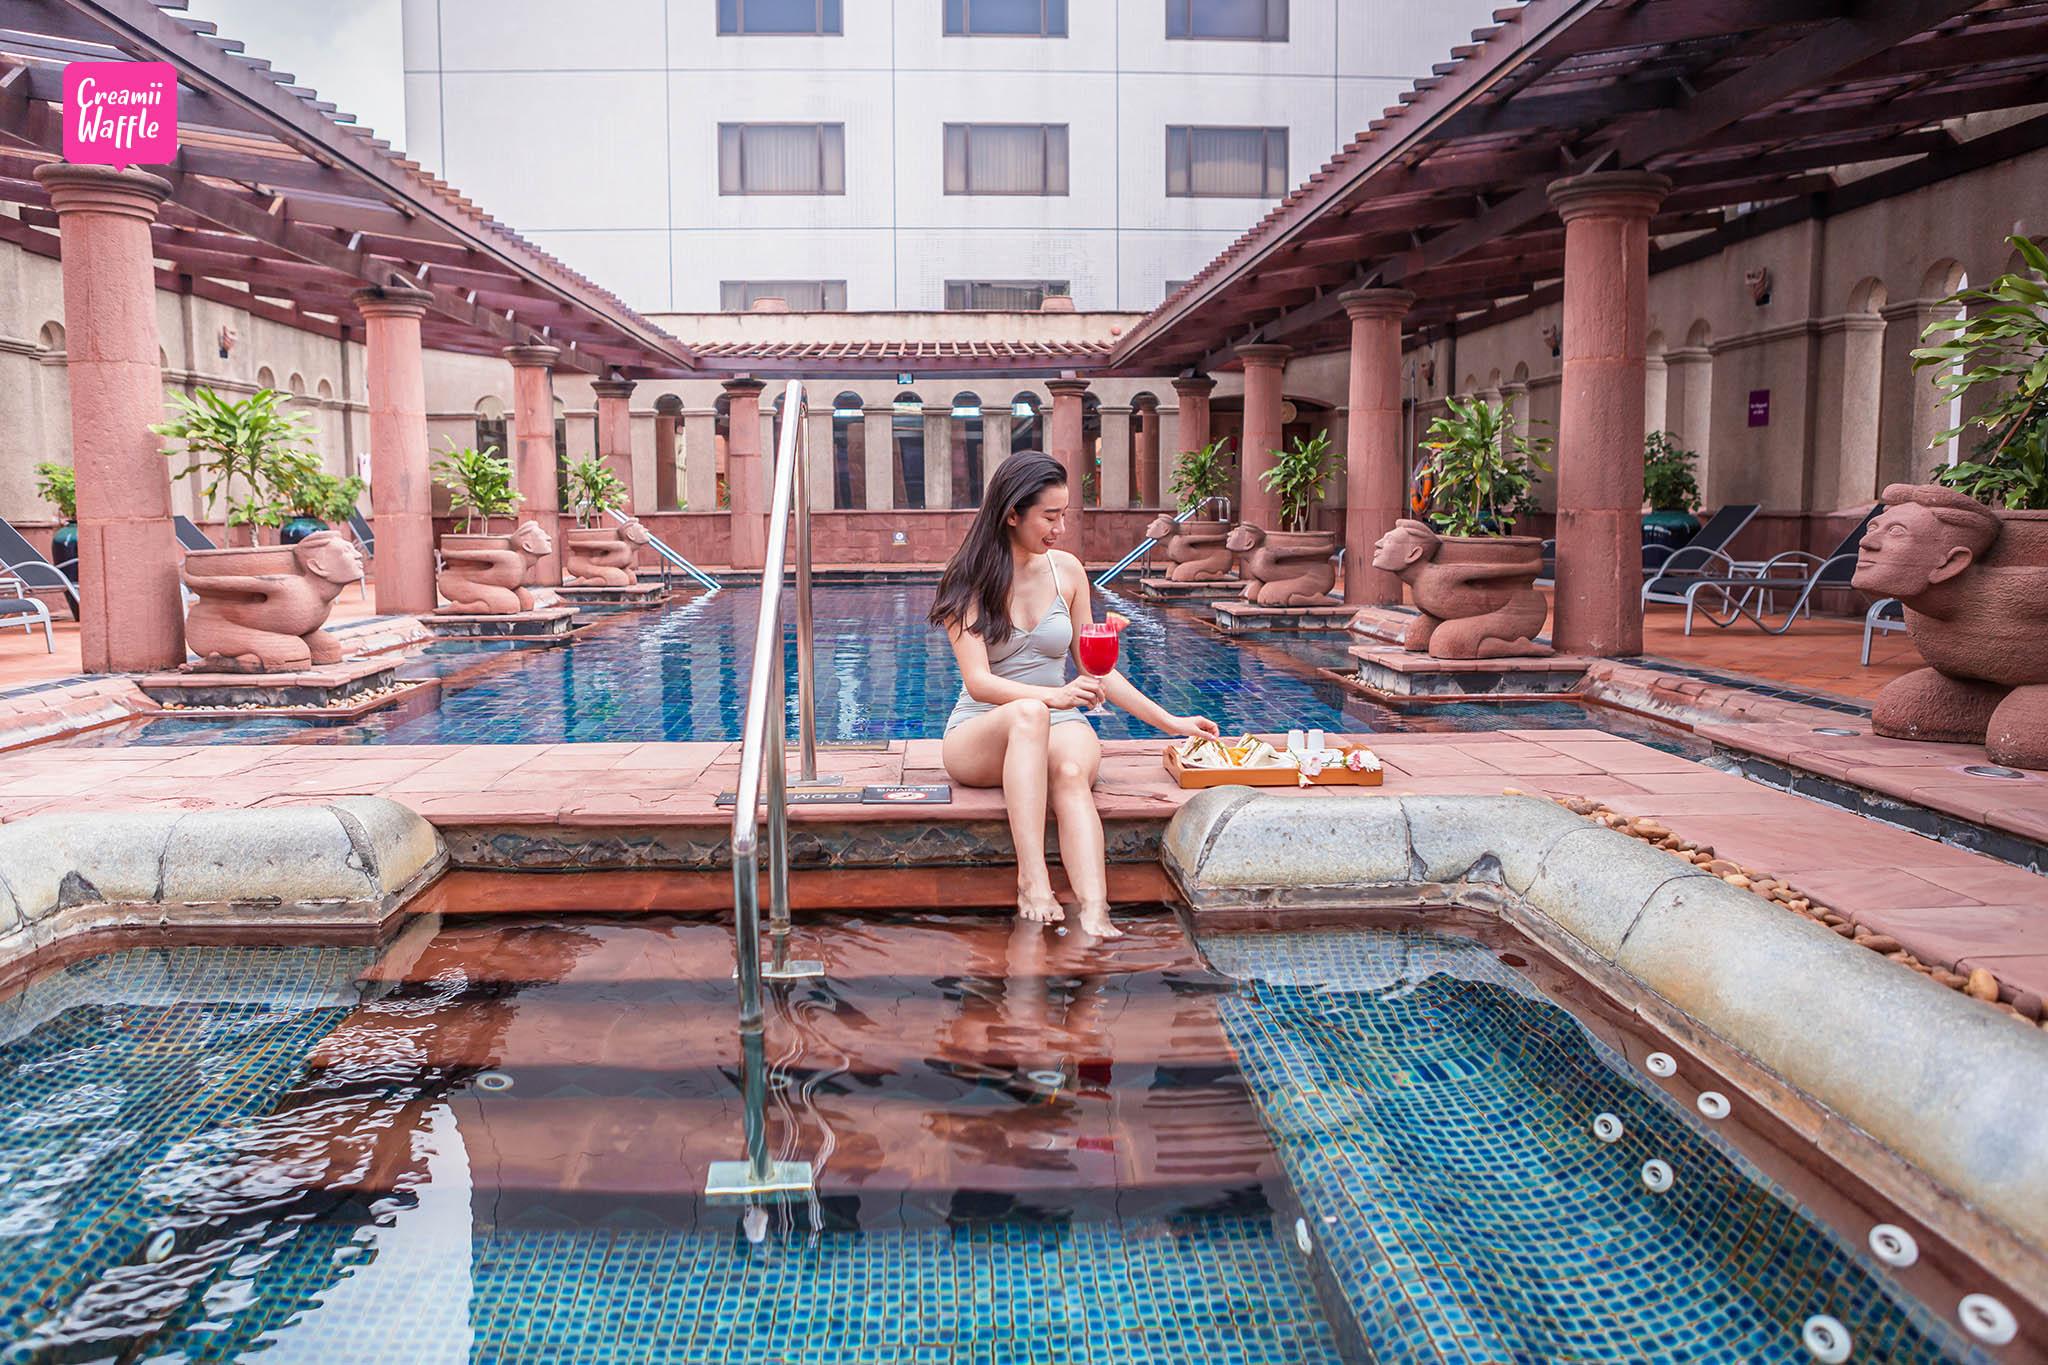 crowneplaza Bangkok รีวิว คราวน์ พลาซ่า